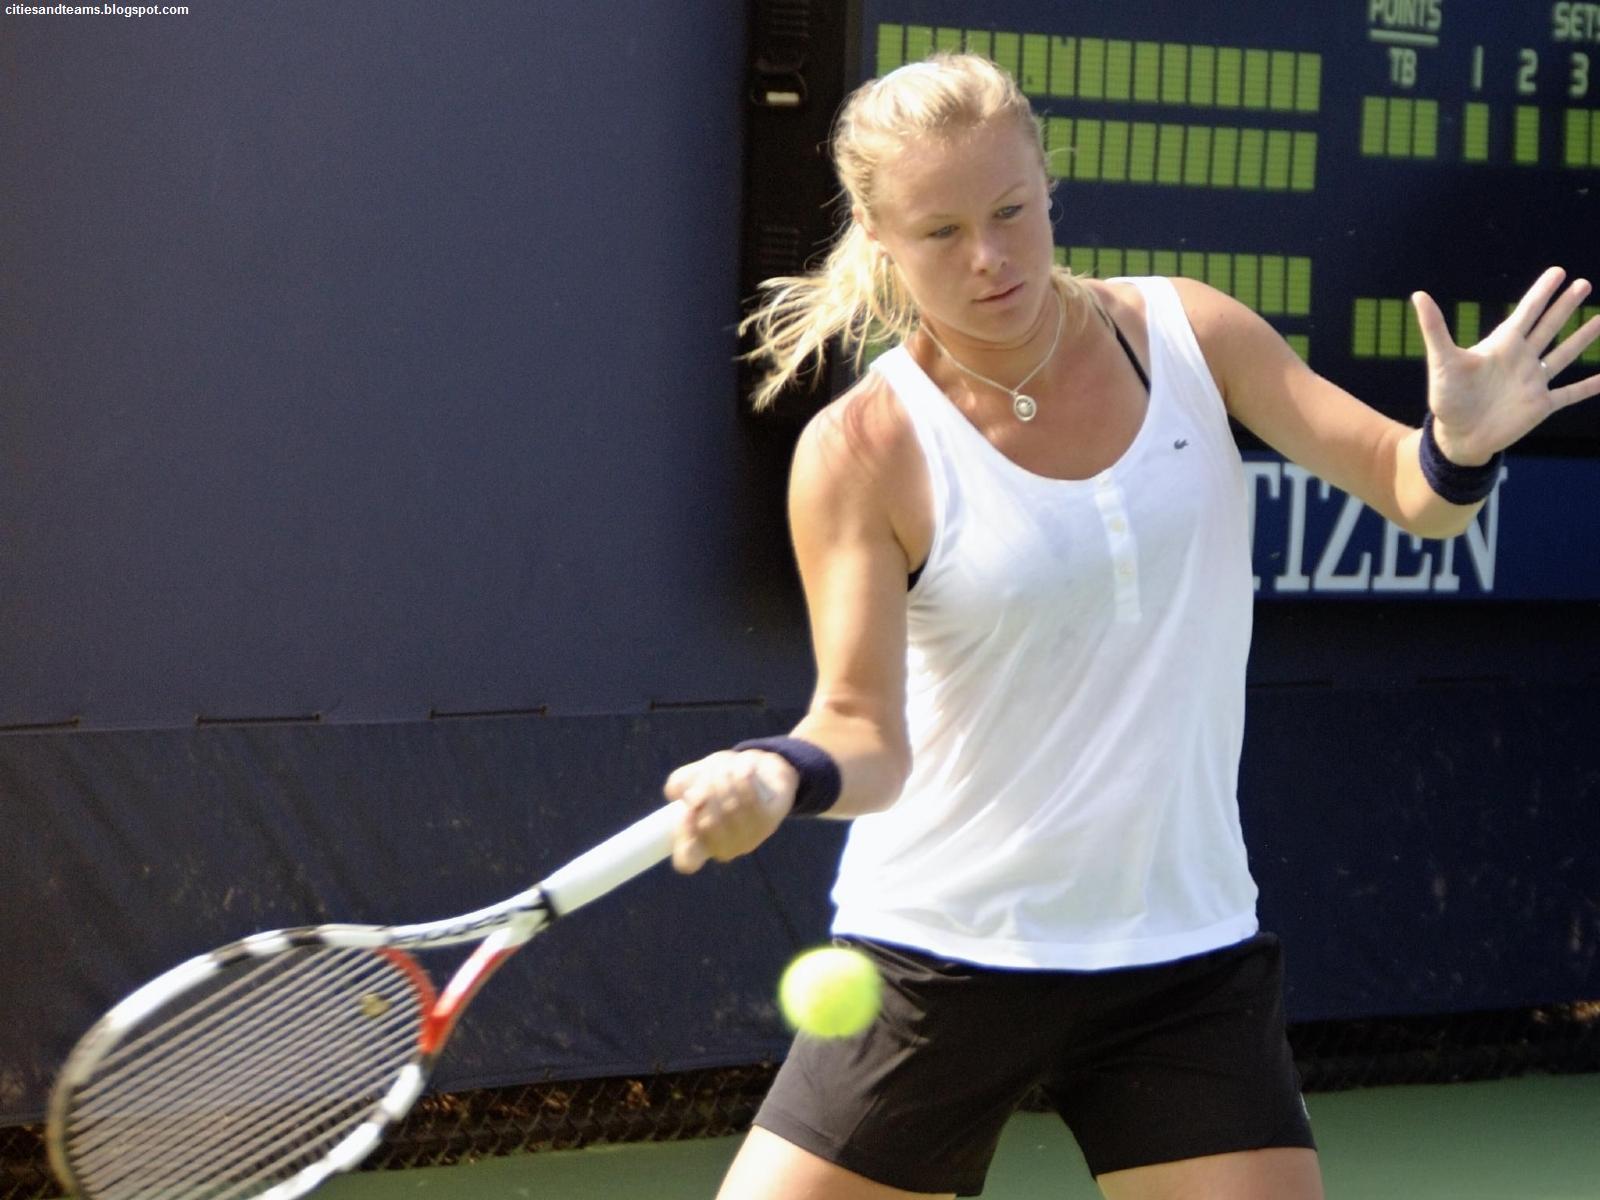 http://1.bp.blogspot.com/-mtvFDjxgDpo/UH16h3E2DpI/AAAAAAAAIFQ/Jkj5fy2UHmU/s1600/Vera_Dushevina_Beautiful_Cute_Blonde_Russian_Tennis_Player_Hd_Desktop_Wallpaper_citiesandteams.blogspot.com.jpg